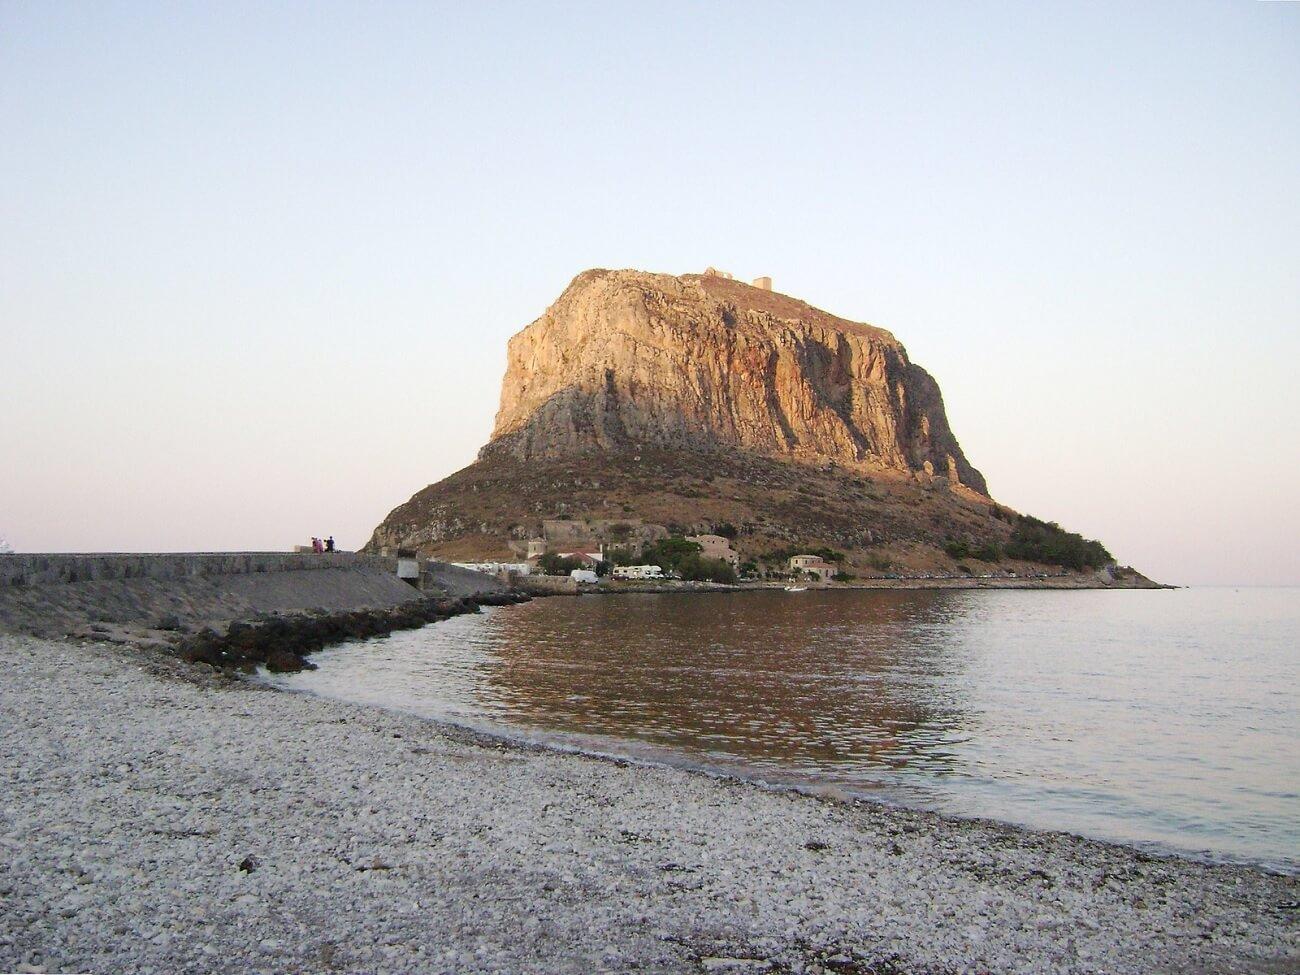 L'isola di Monemvasia vista da Nea Monemvasia